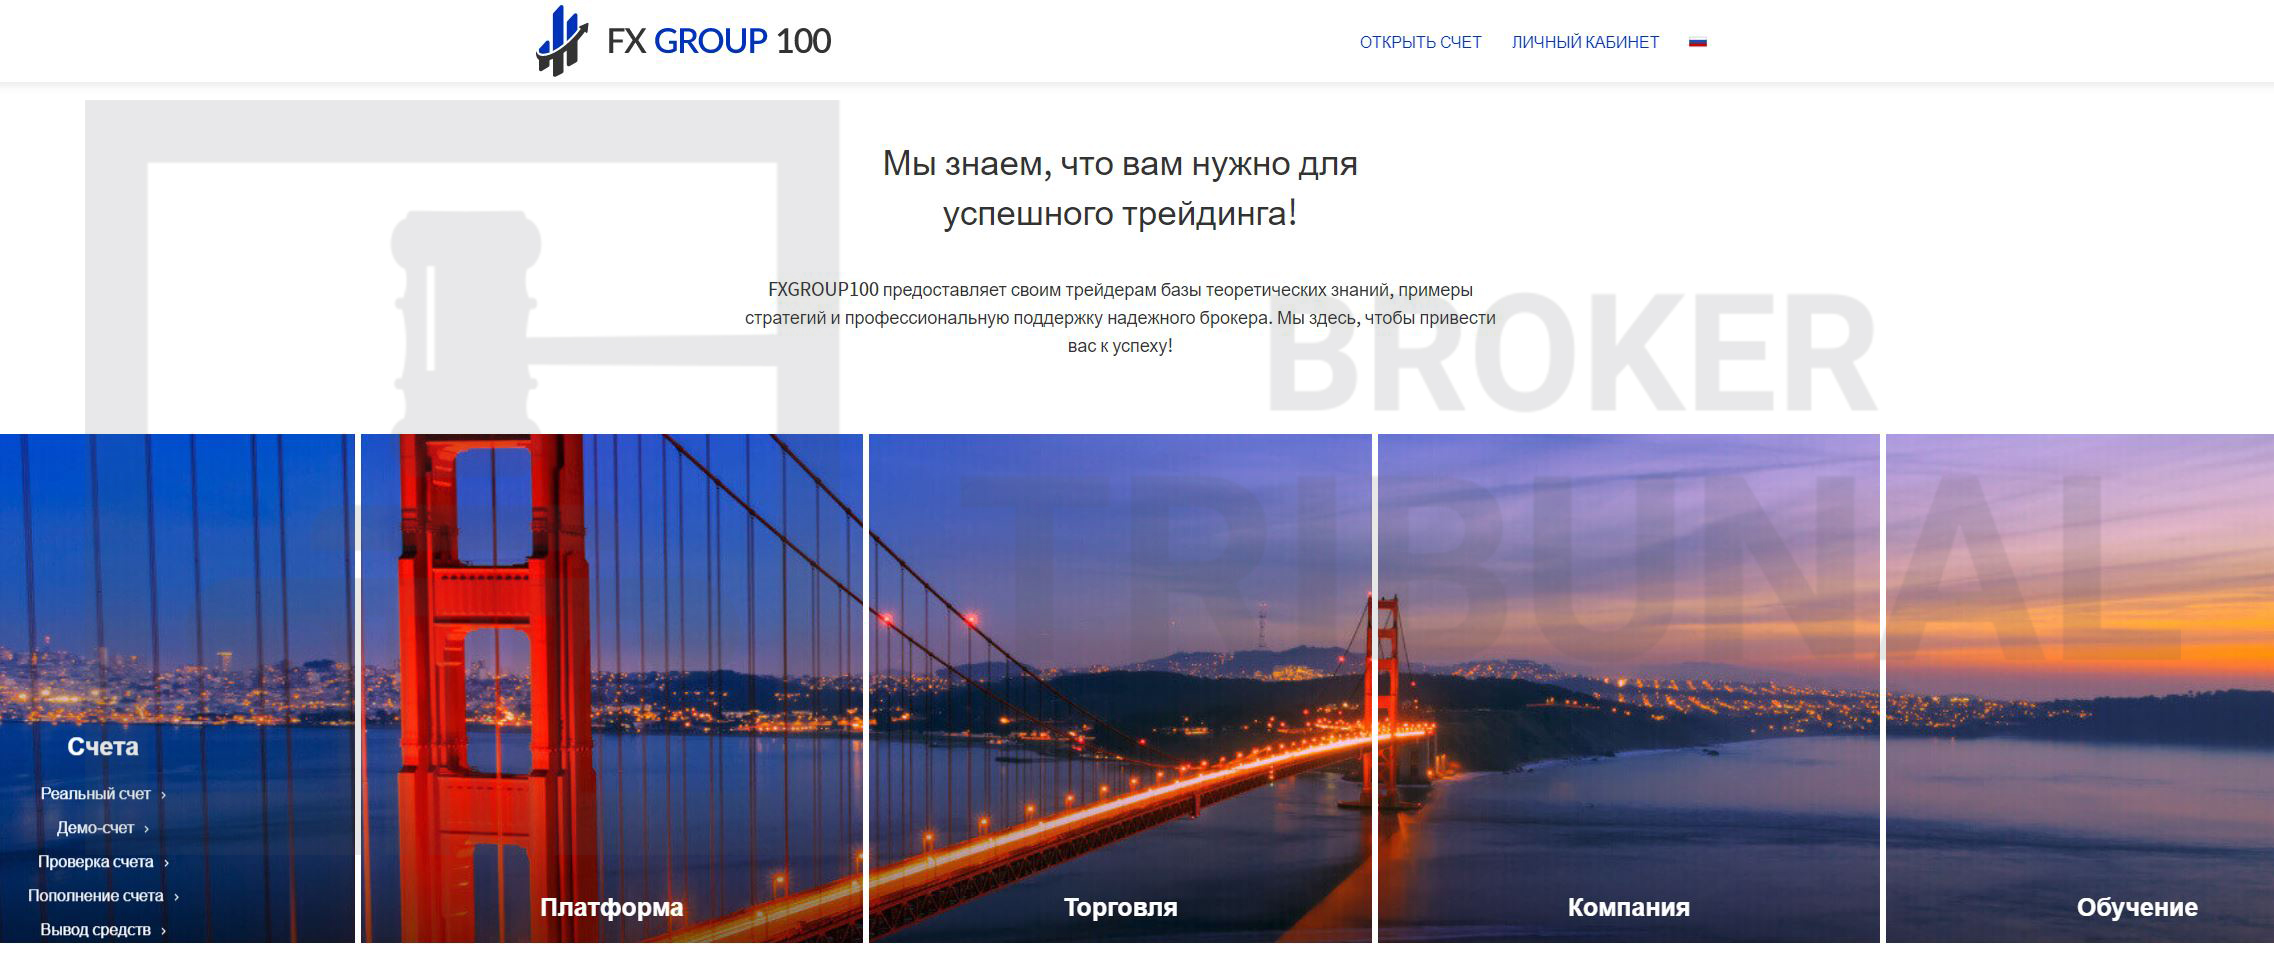 FxGroup100